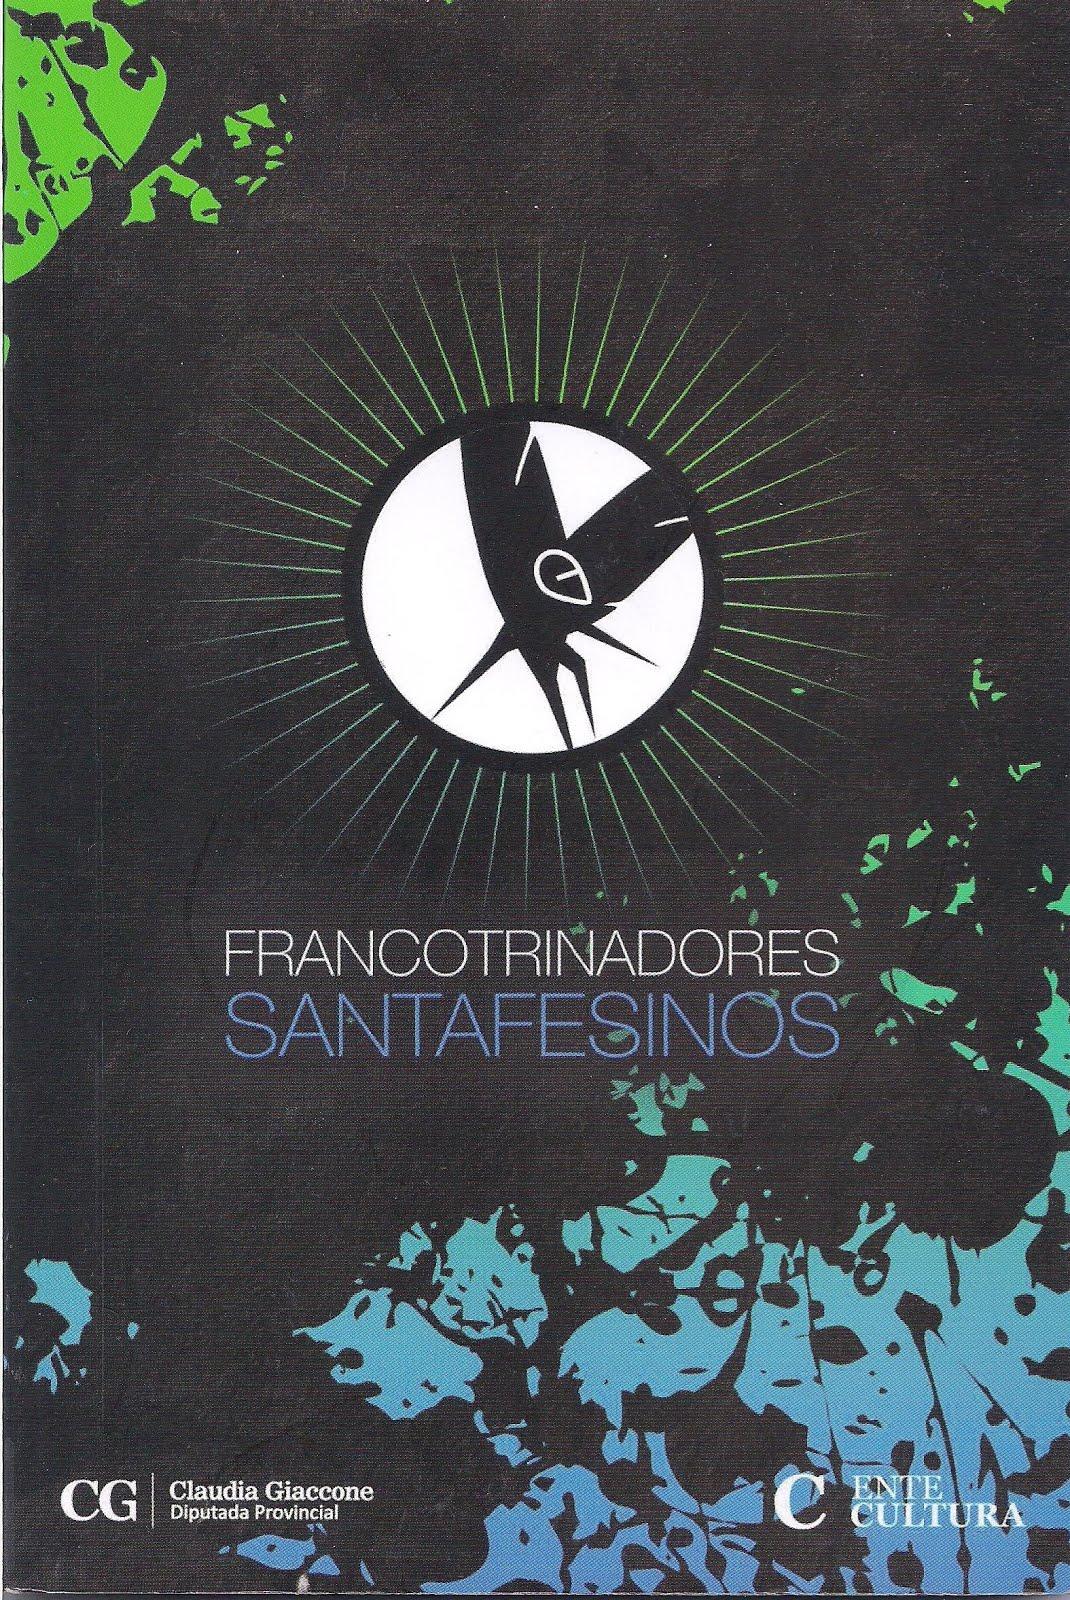 Francotrinadores Santafesinos